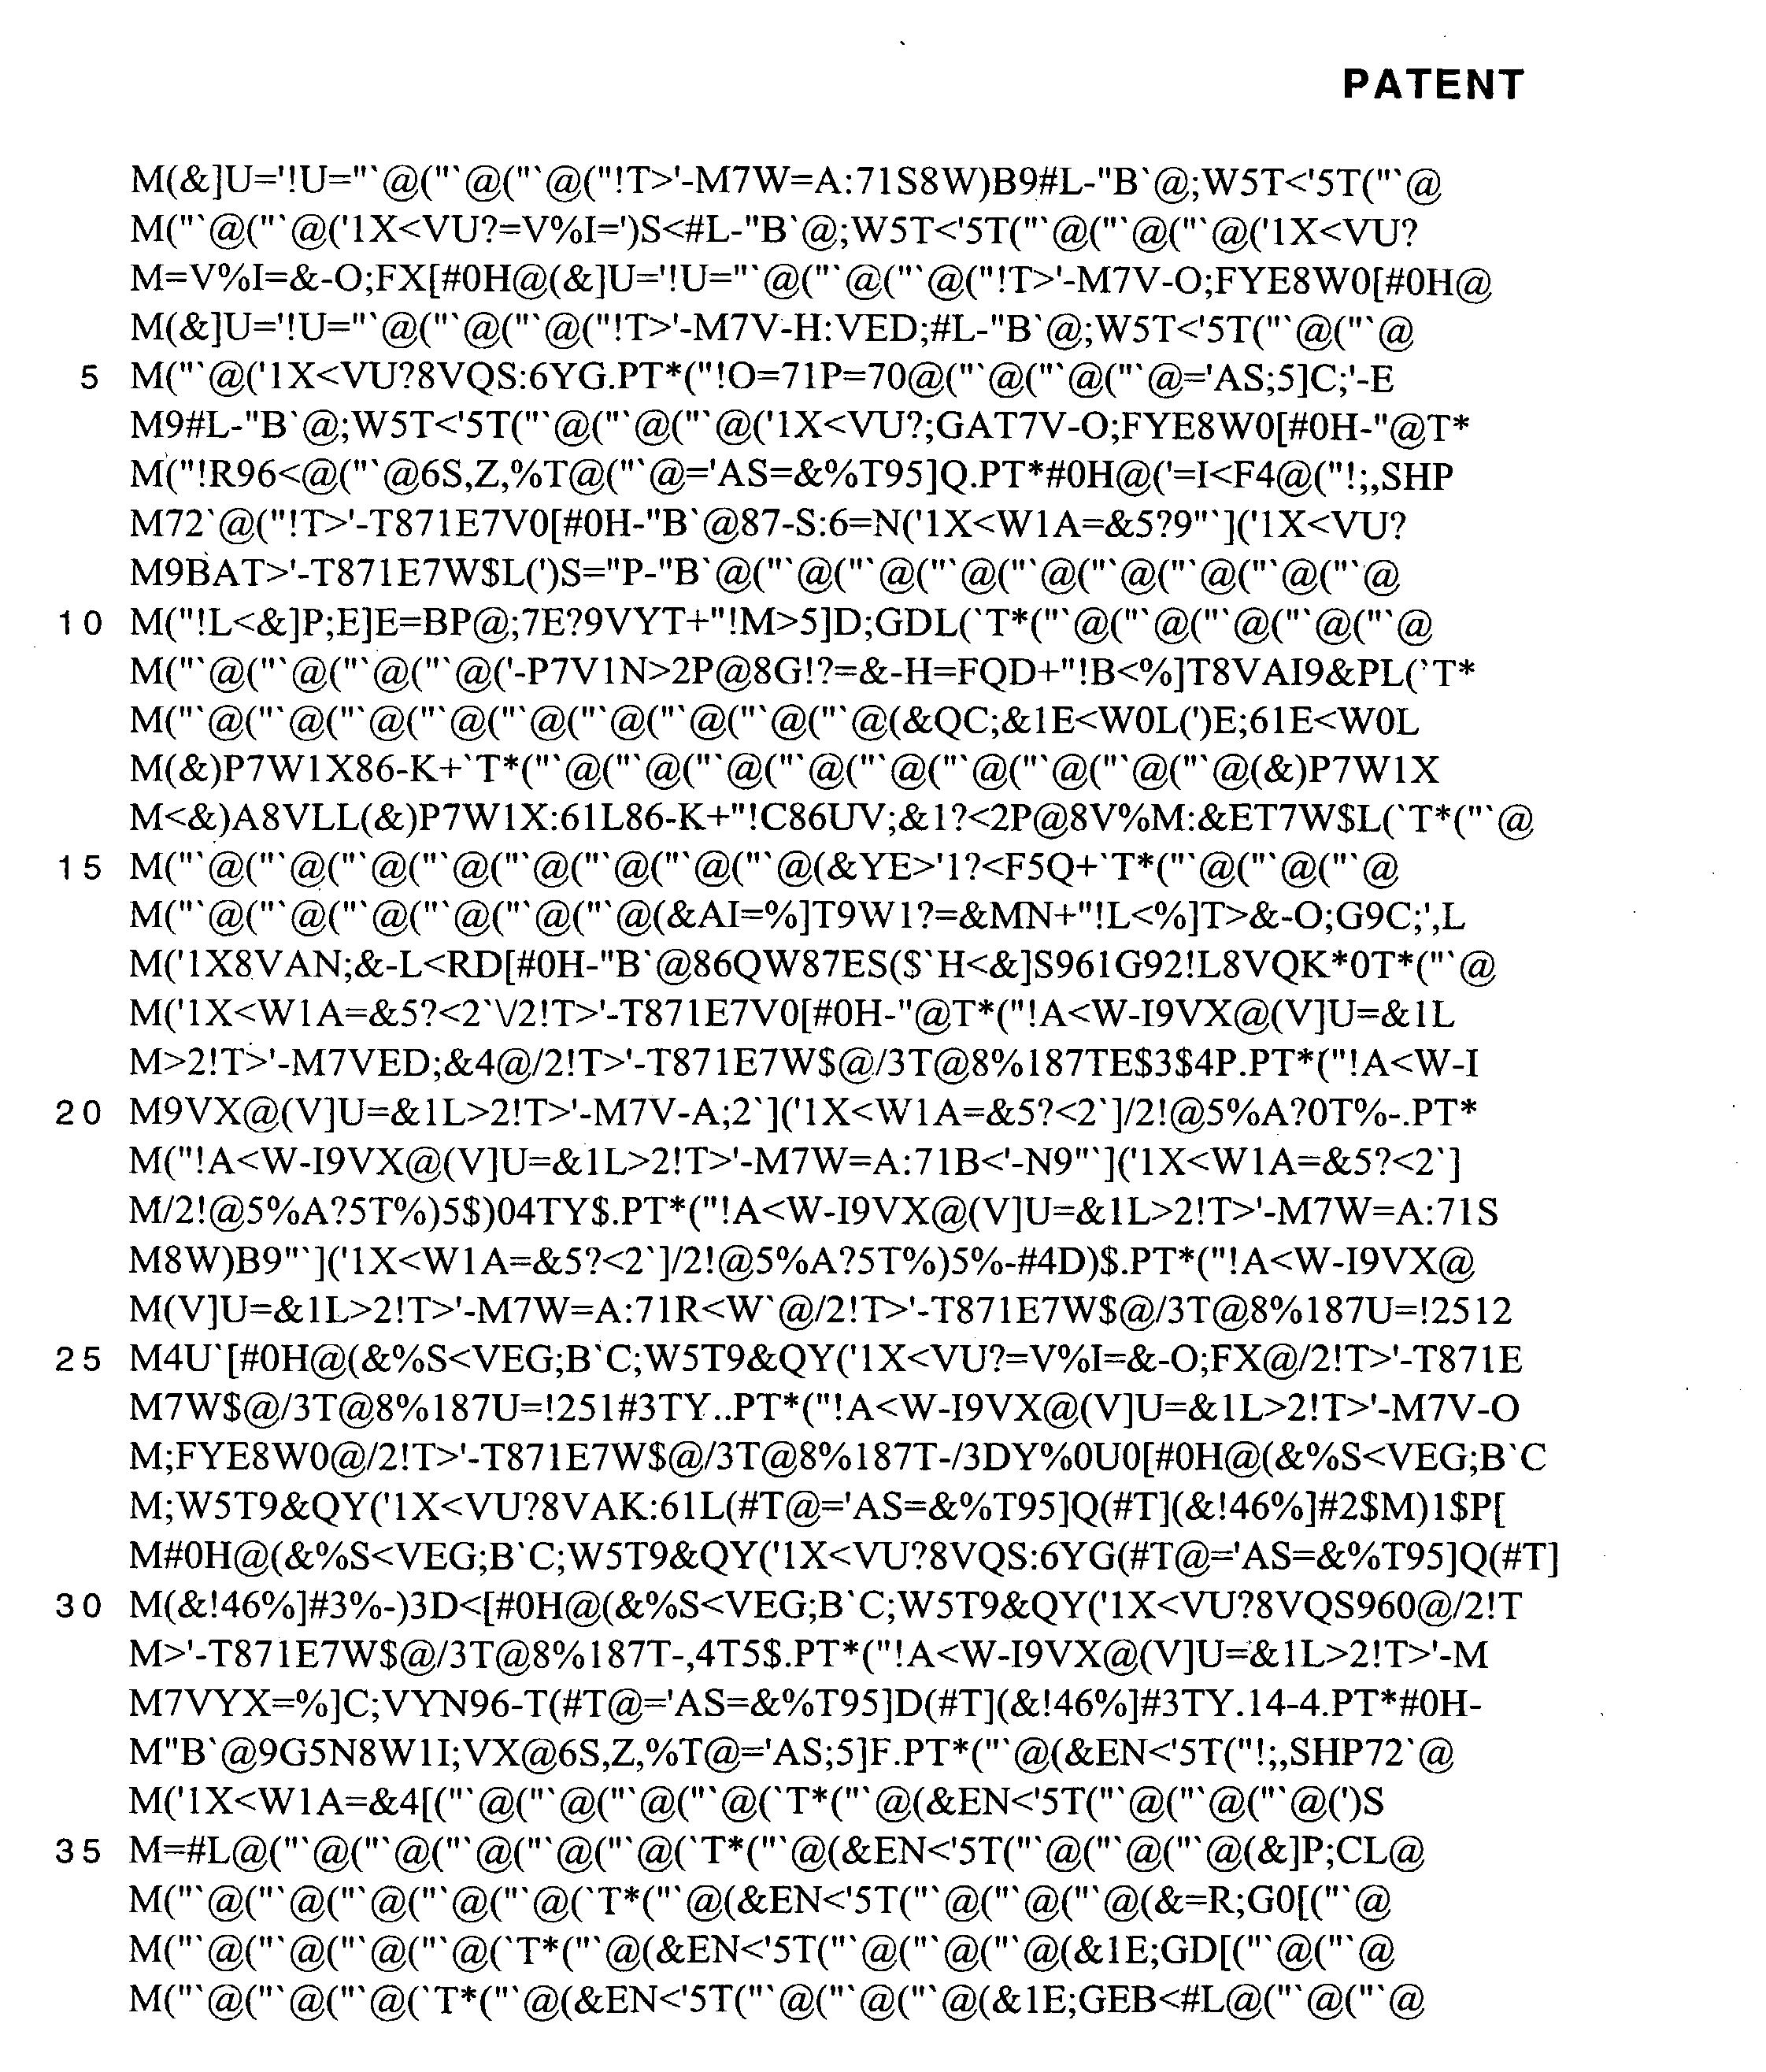 Figure US20030174721A1-20030918-P00002